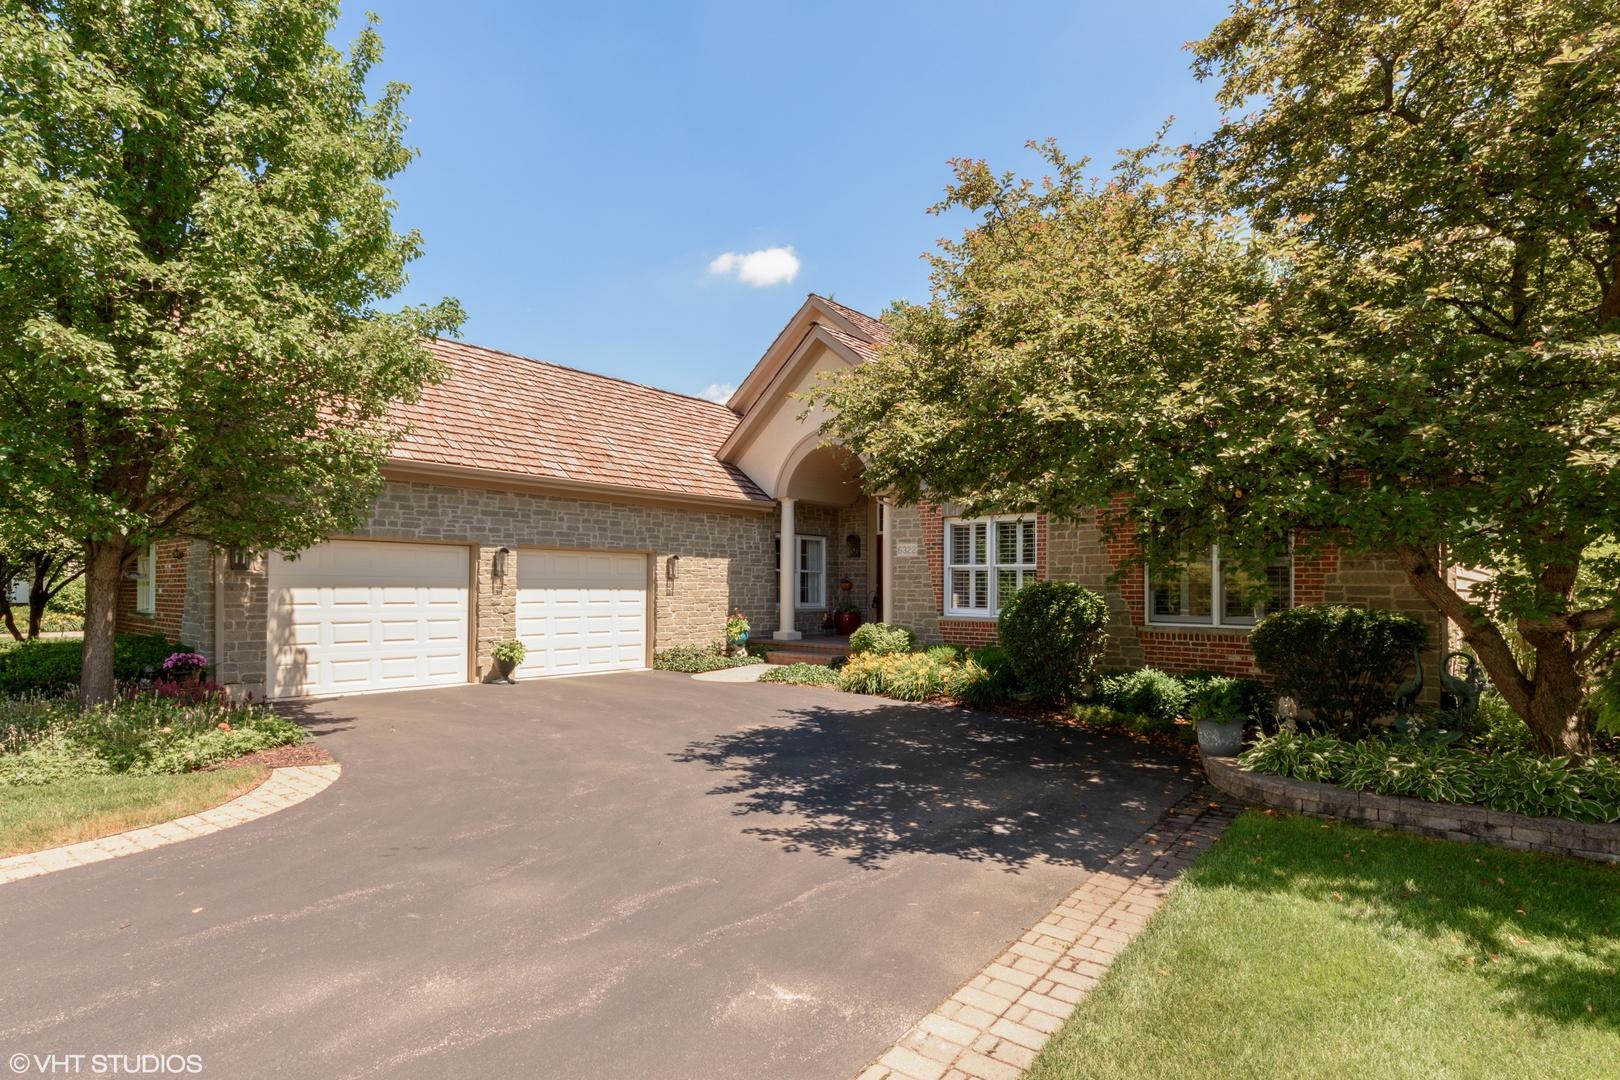 6322 Valley View Lane, Long Grove, Illinois 60047